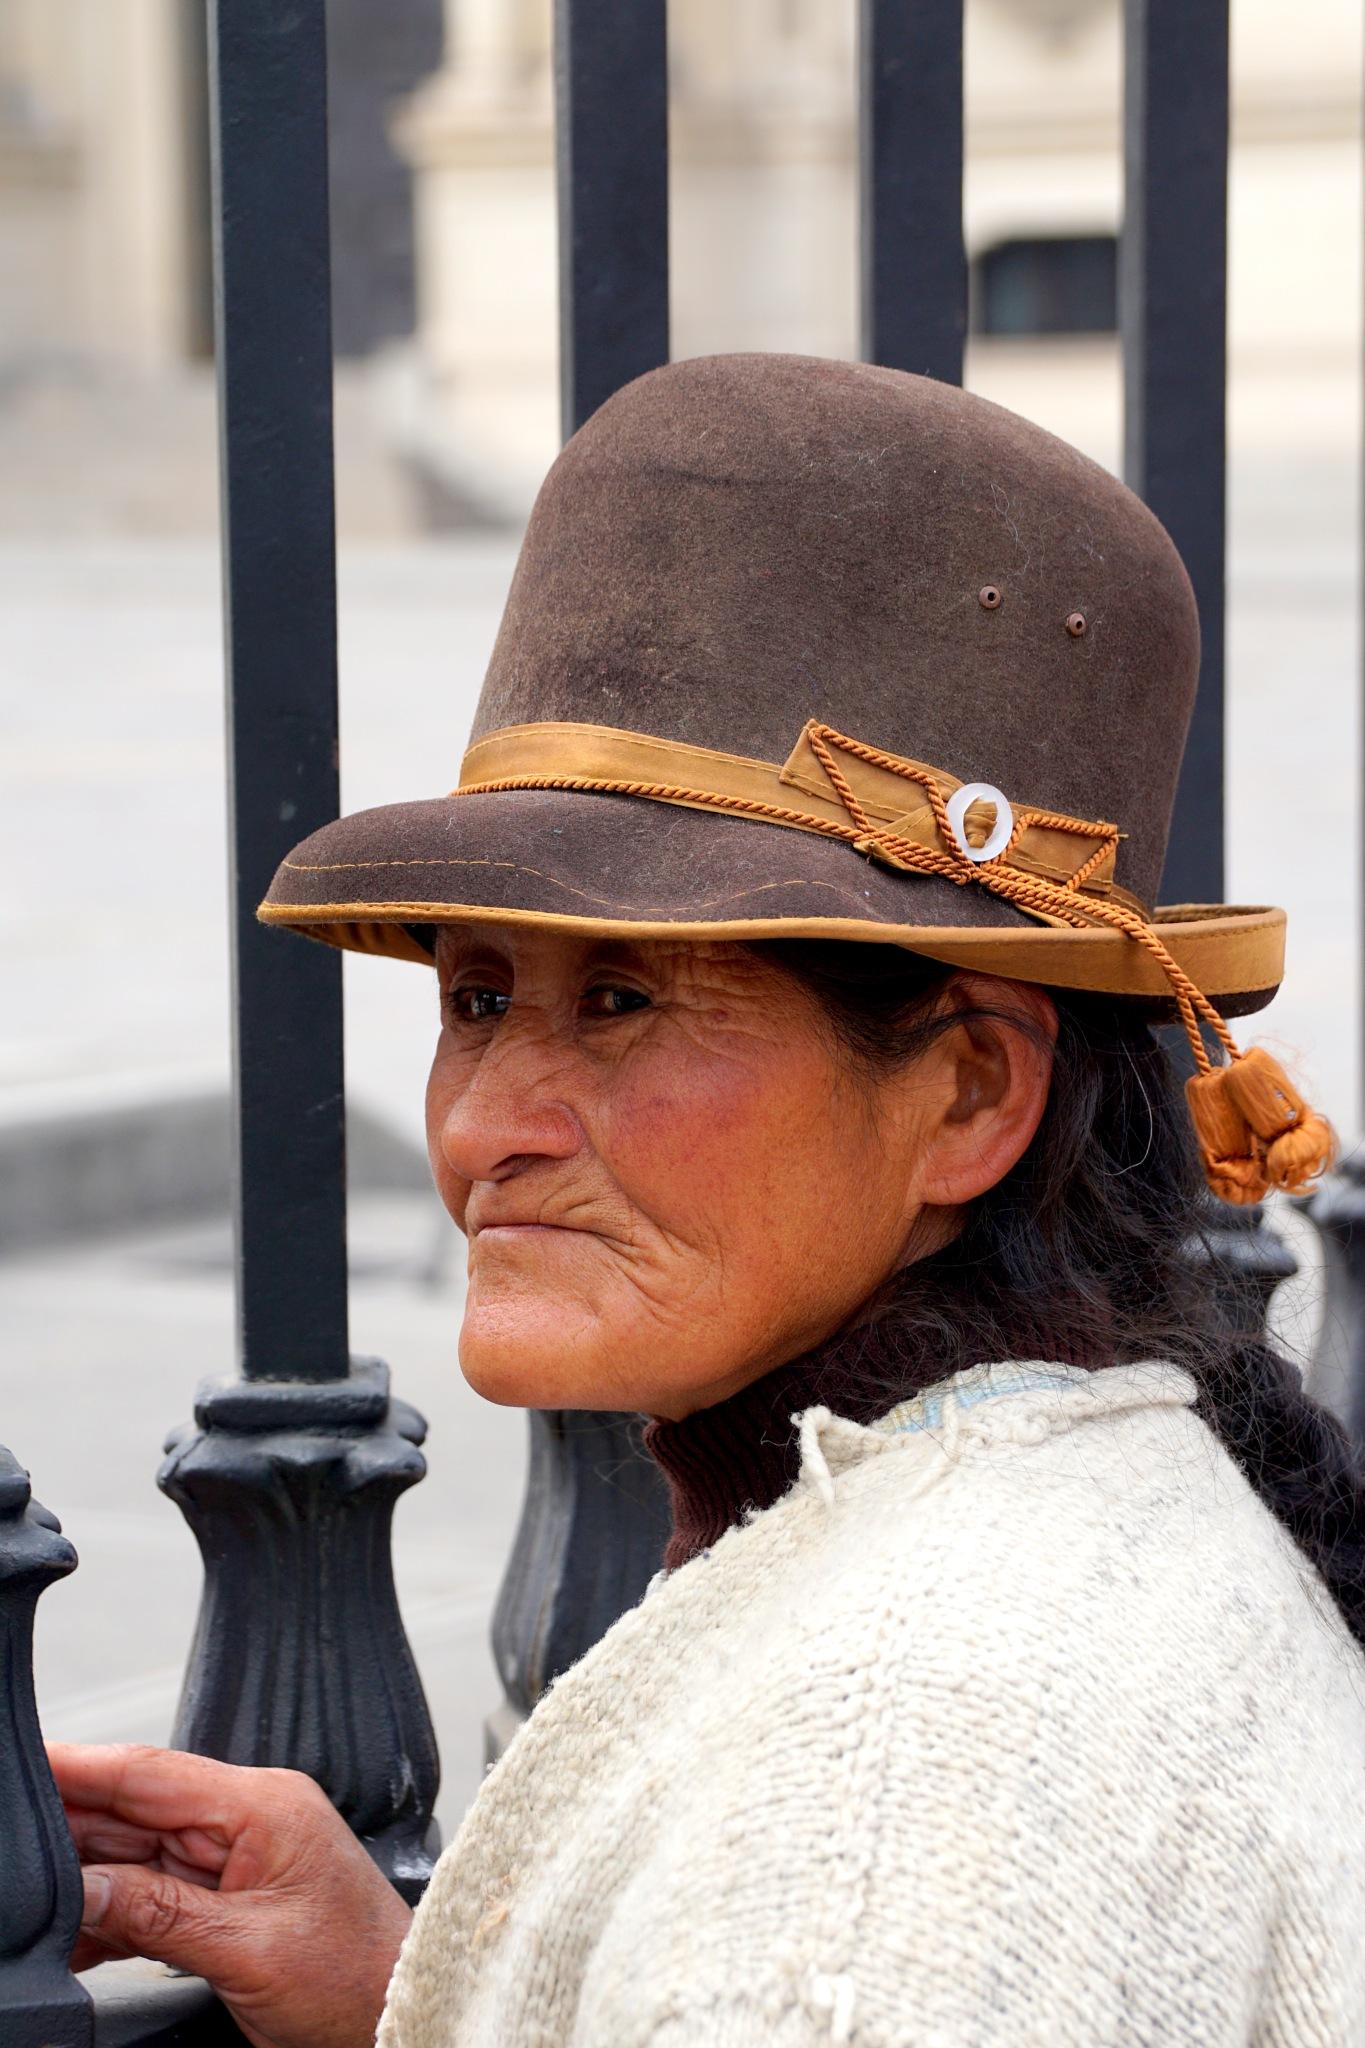 Old lady by Mariëlla van der Lans-Schosswald